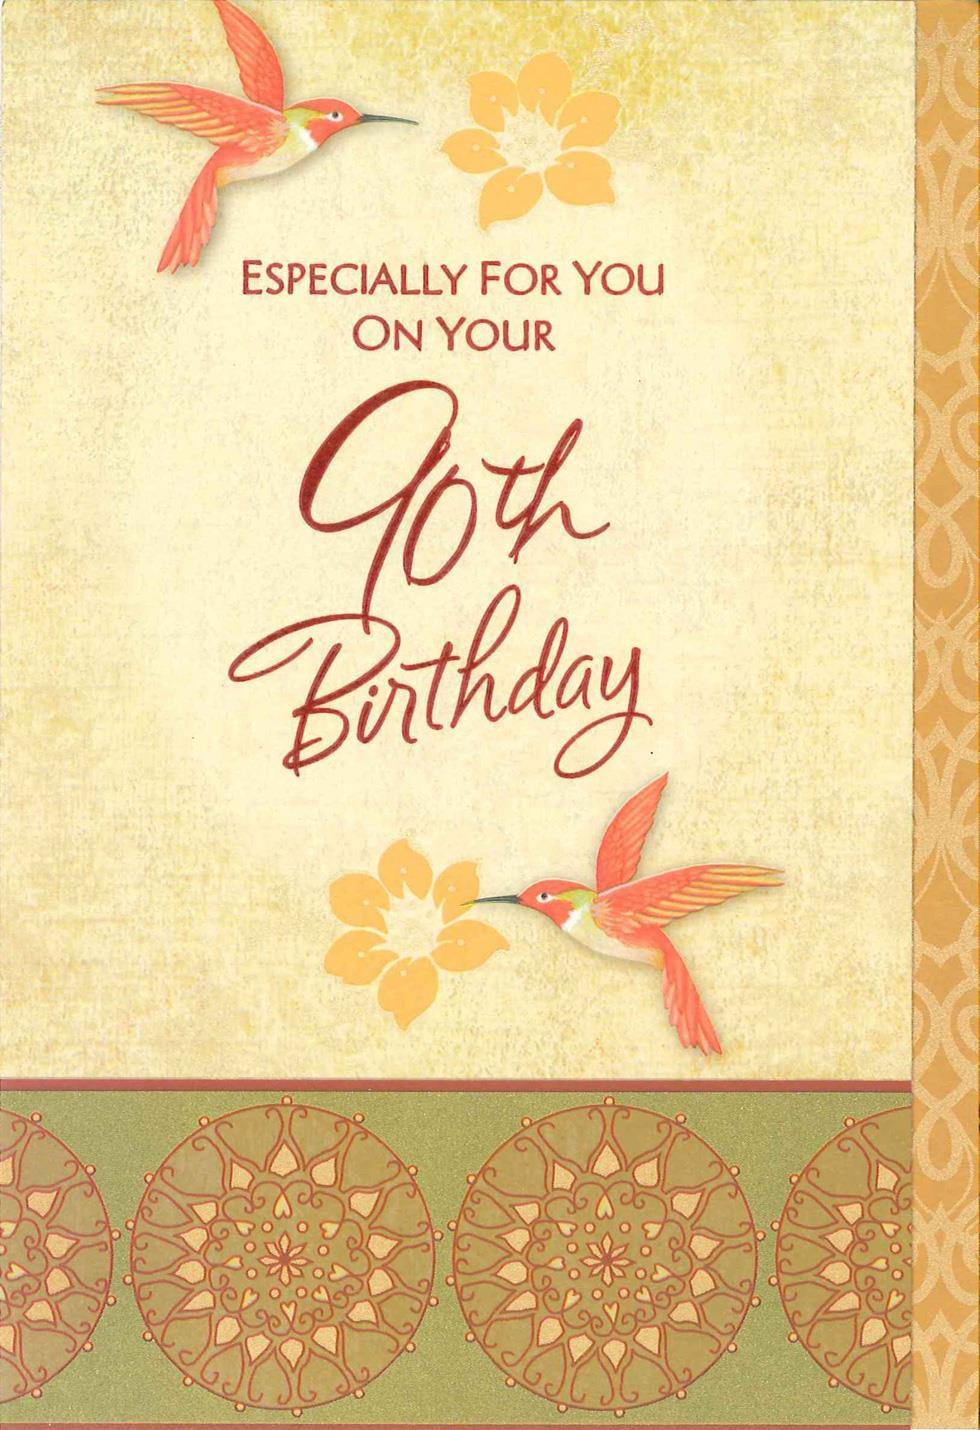 Hallmark Online Birthday Card  Hummingbirds and Flowers 90th Birthday Card Greeting